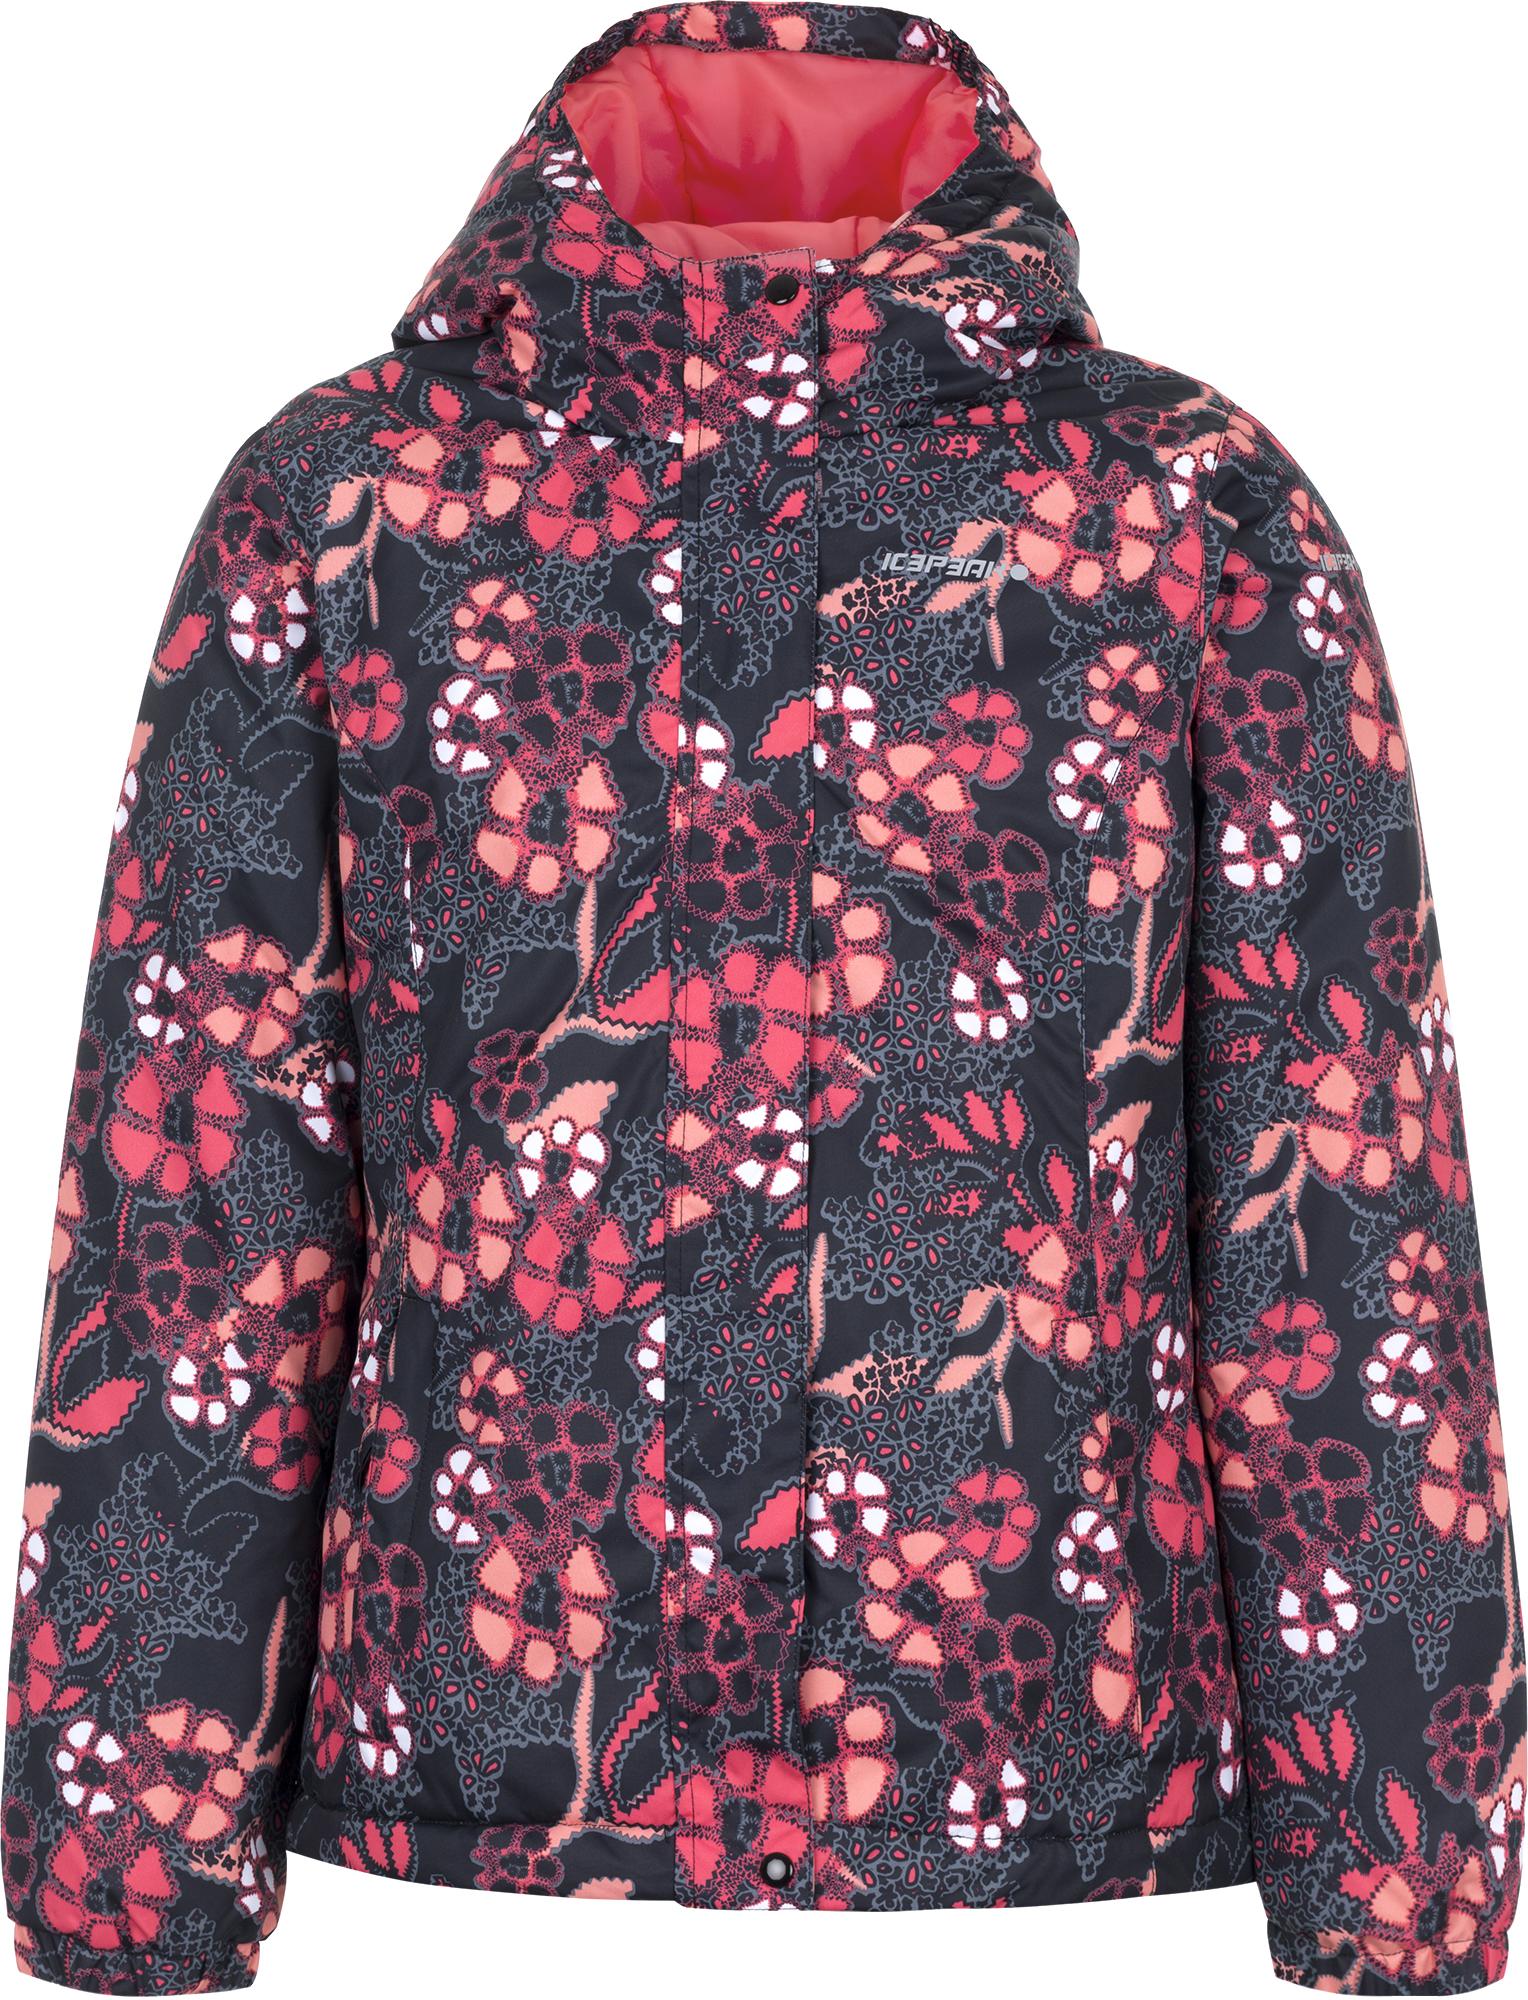 IcePeak Куртка утепленная для девочек IcePeak Rena icepeak ic647egrxn51